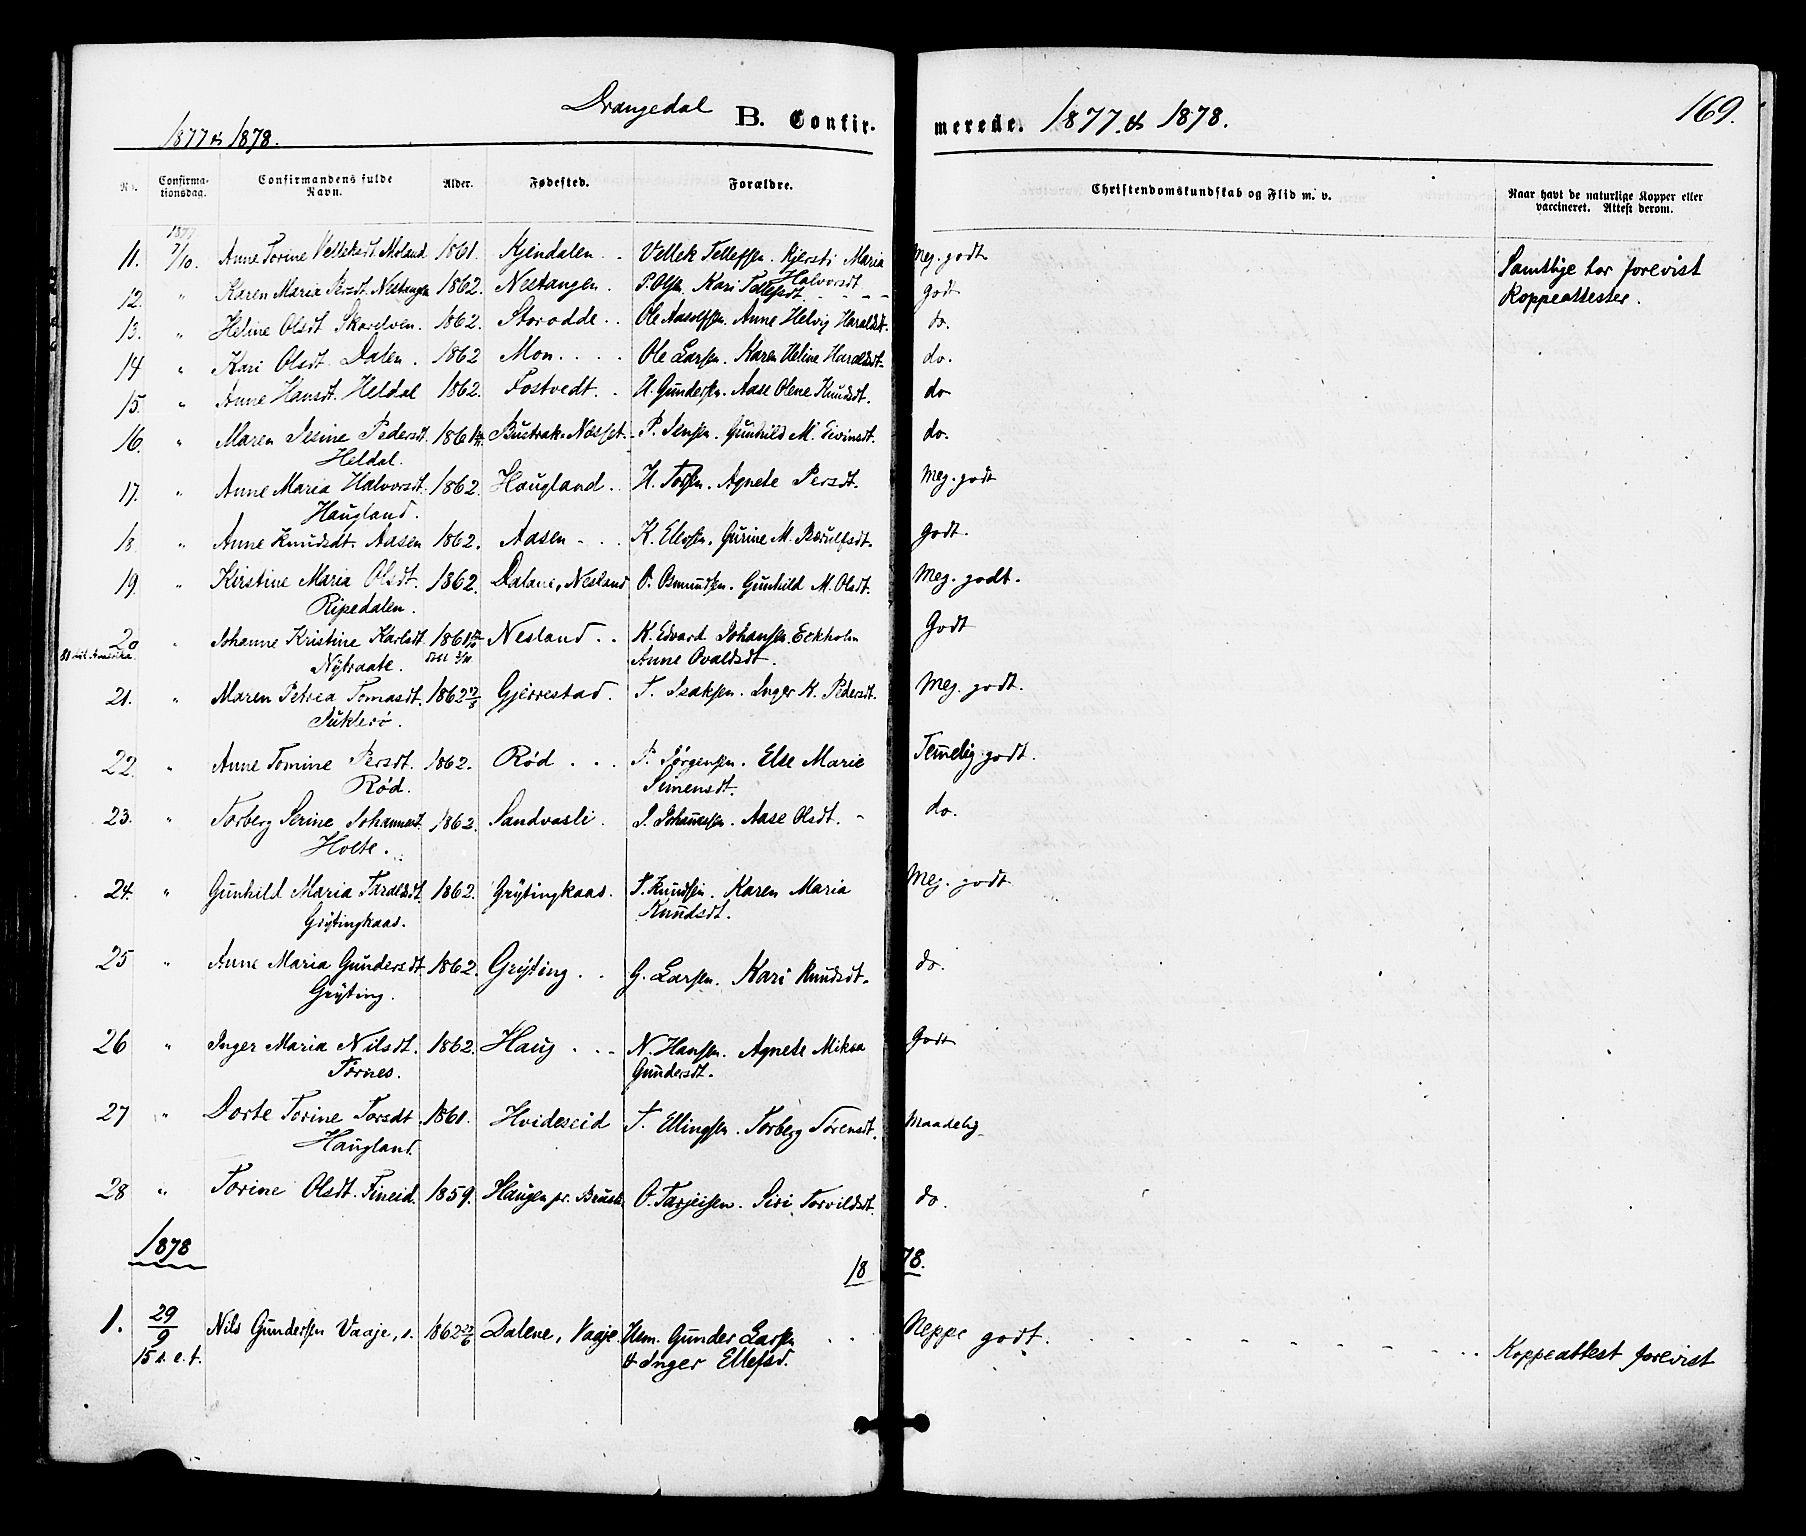 SAKO, Drangedal kirkebøker, F/Fa/L0009: Ministerialbok nr. 9 /1, 1872-1884, s. 169